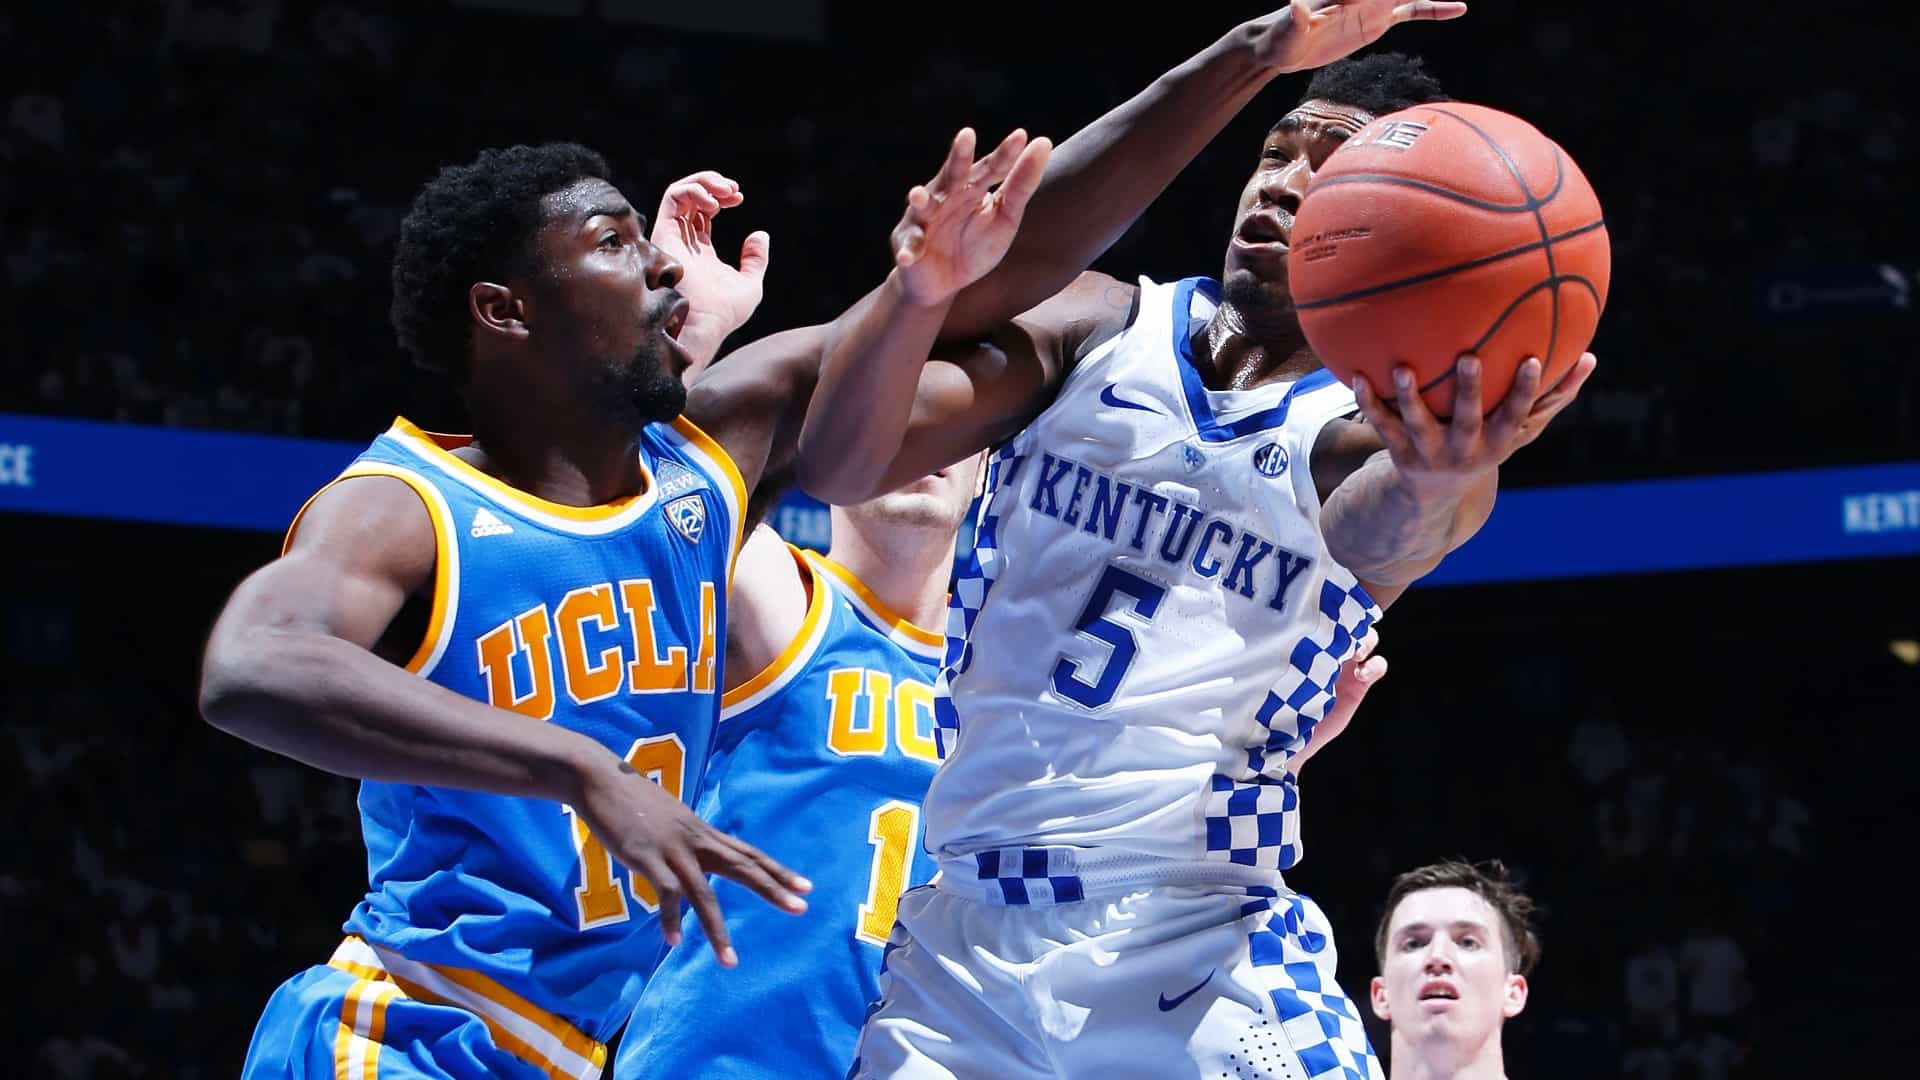 UCLA è tornata! Sconfitta Kentucky